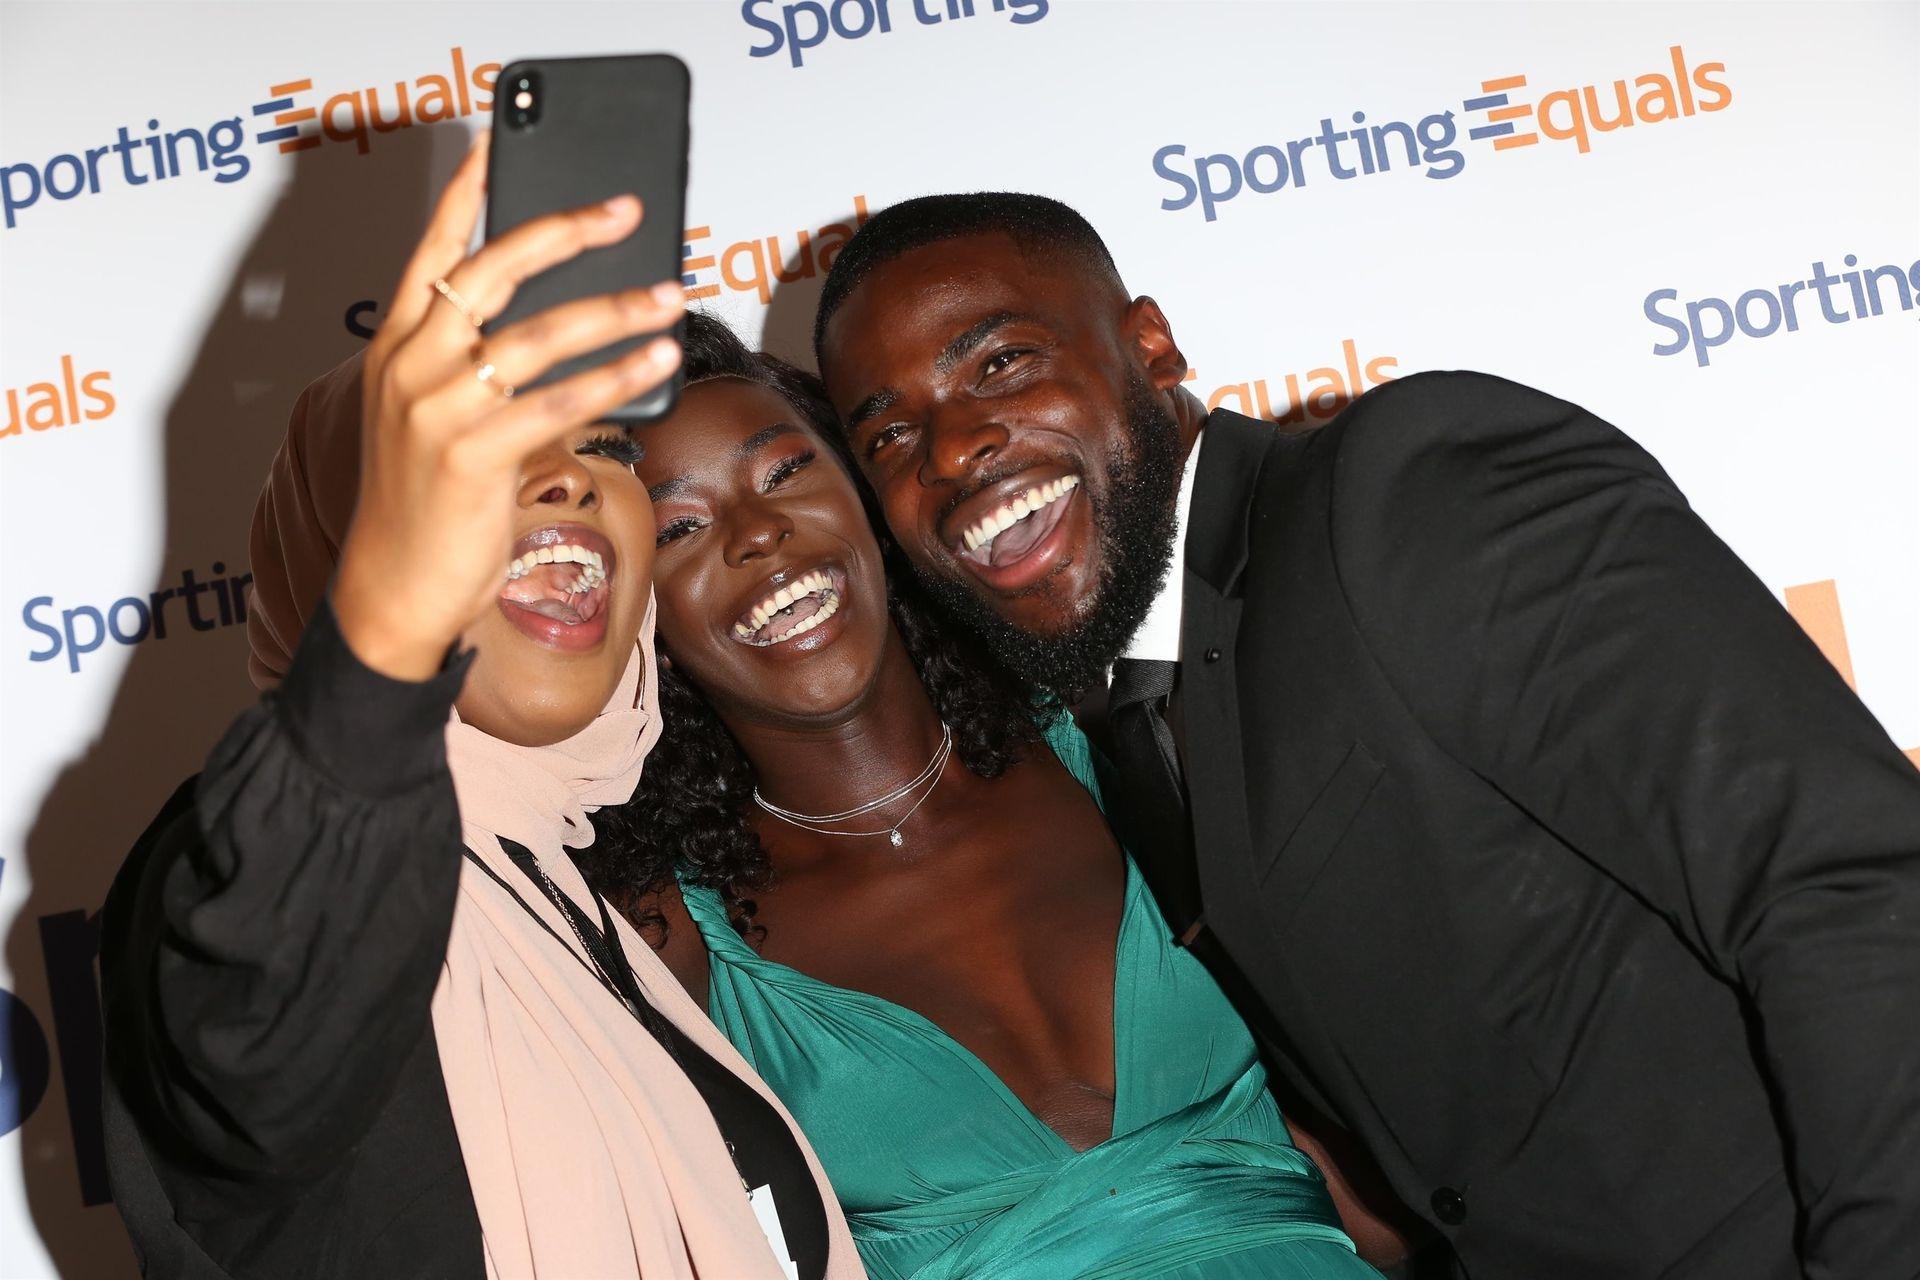 Mike Boateng & Priscilla Anyabu Are Seen At British Ethnic Diversity Sports Awards 0079